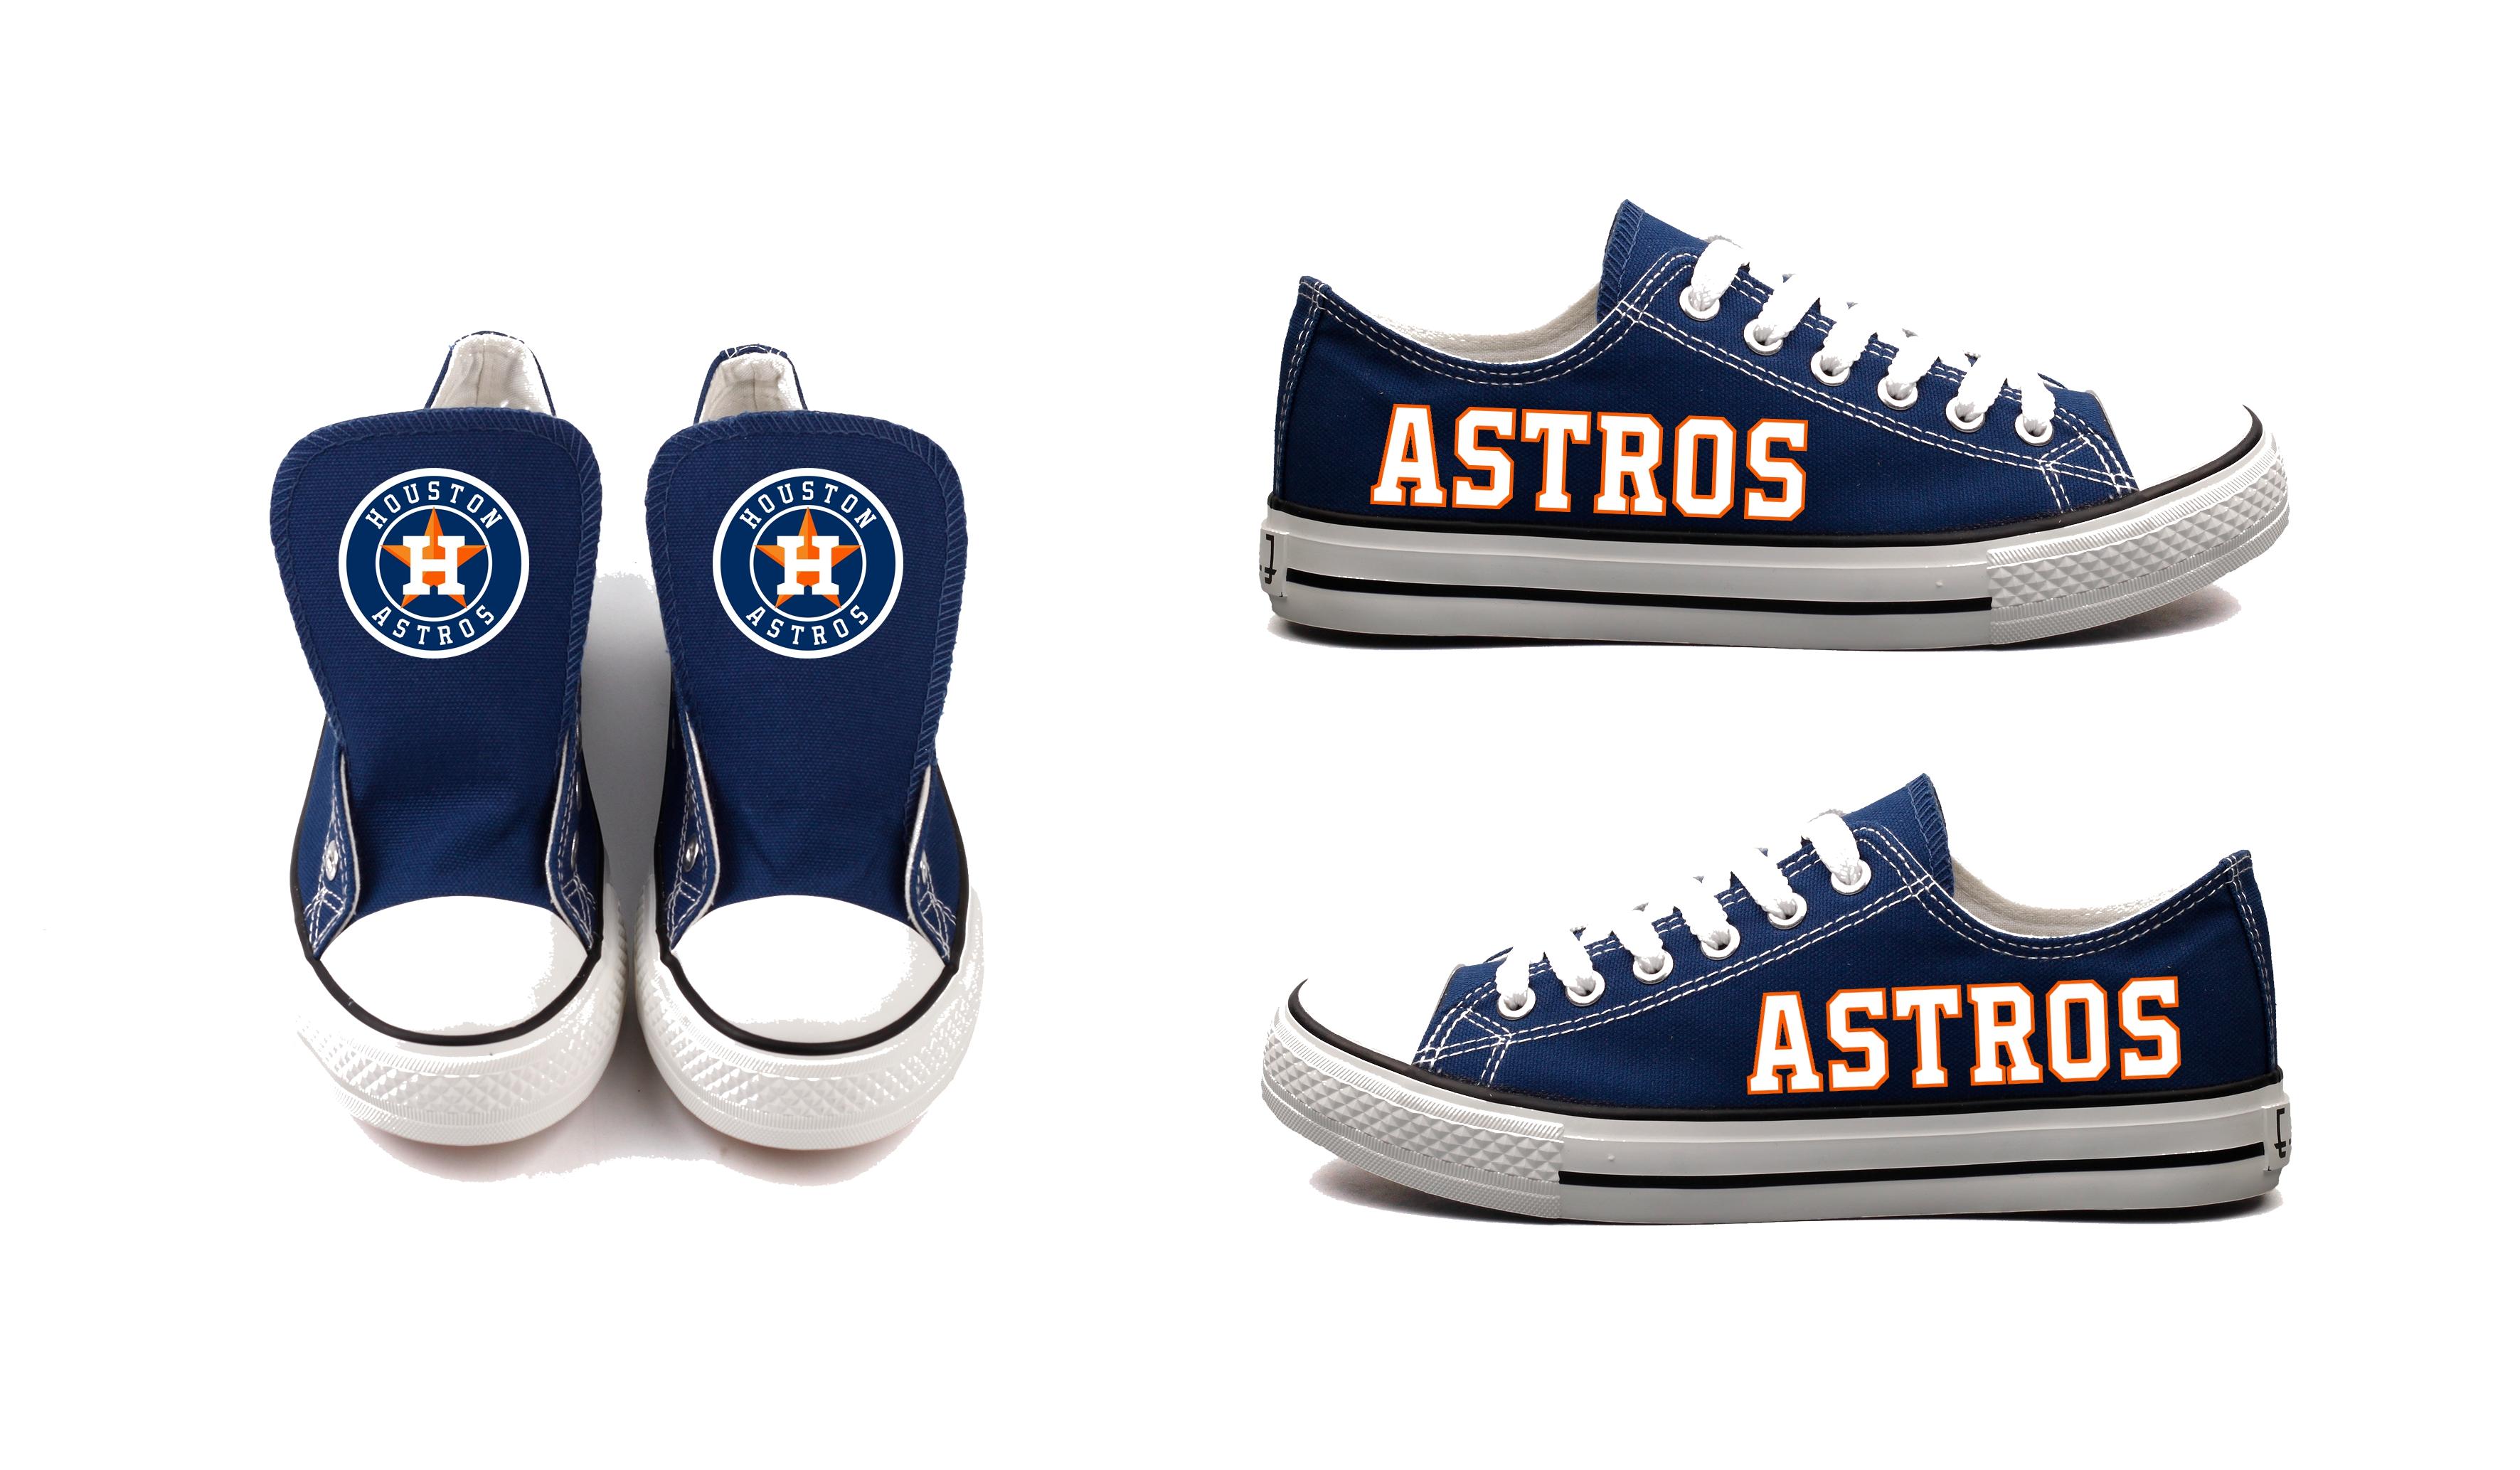 e68fdfc1 Houston Astros : fanswish.cn